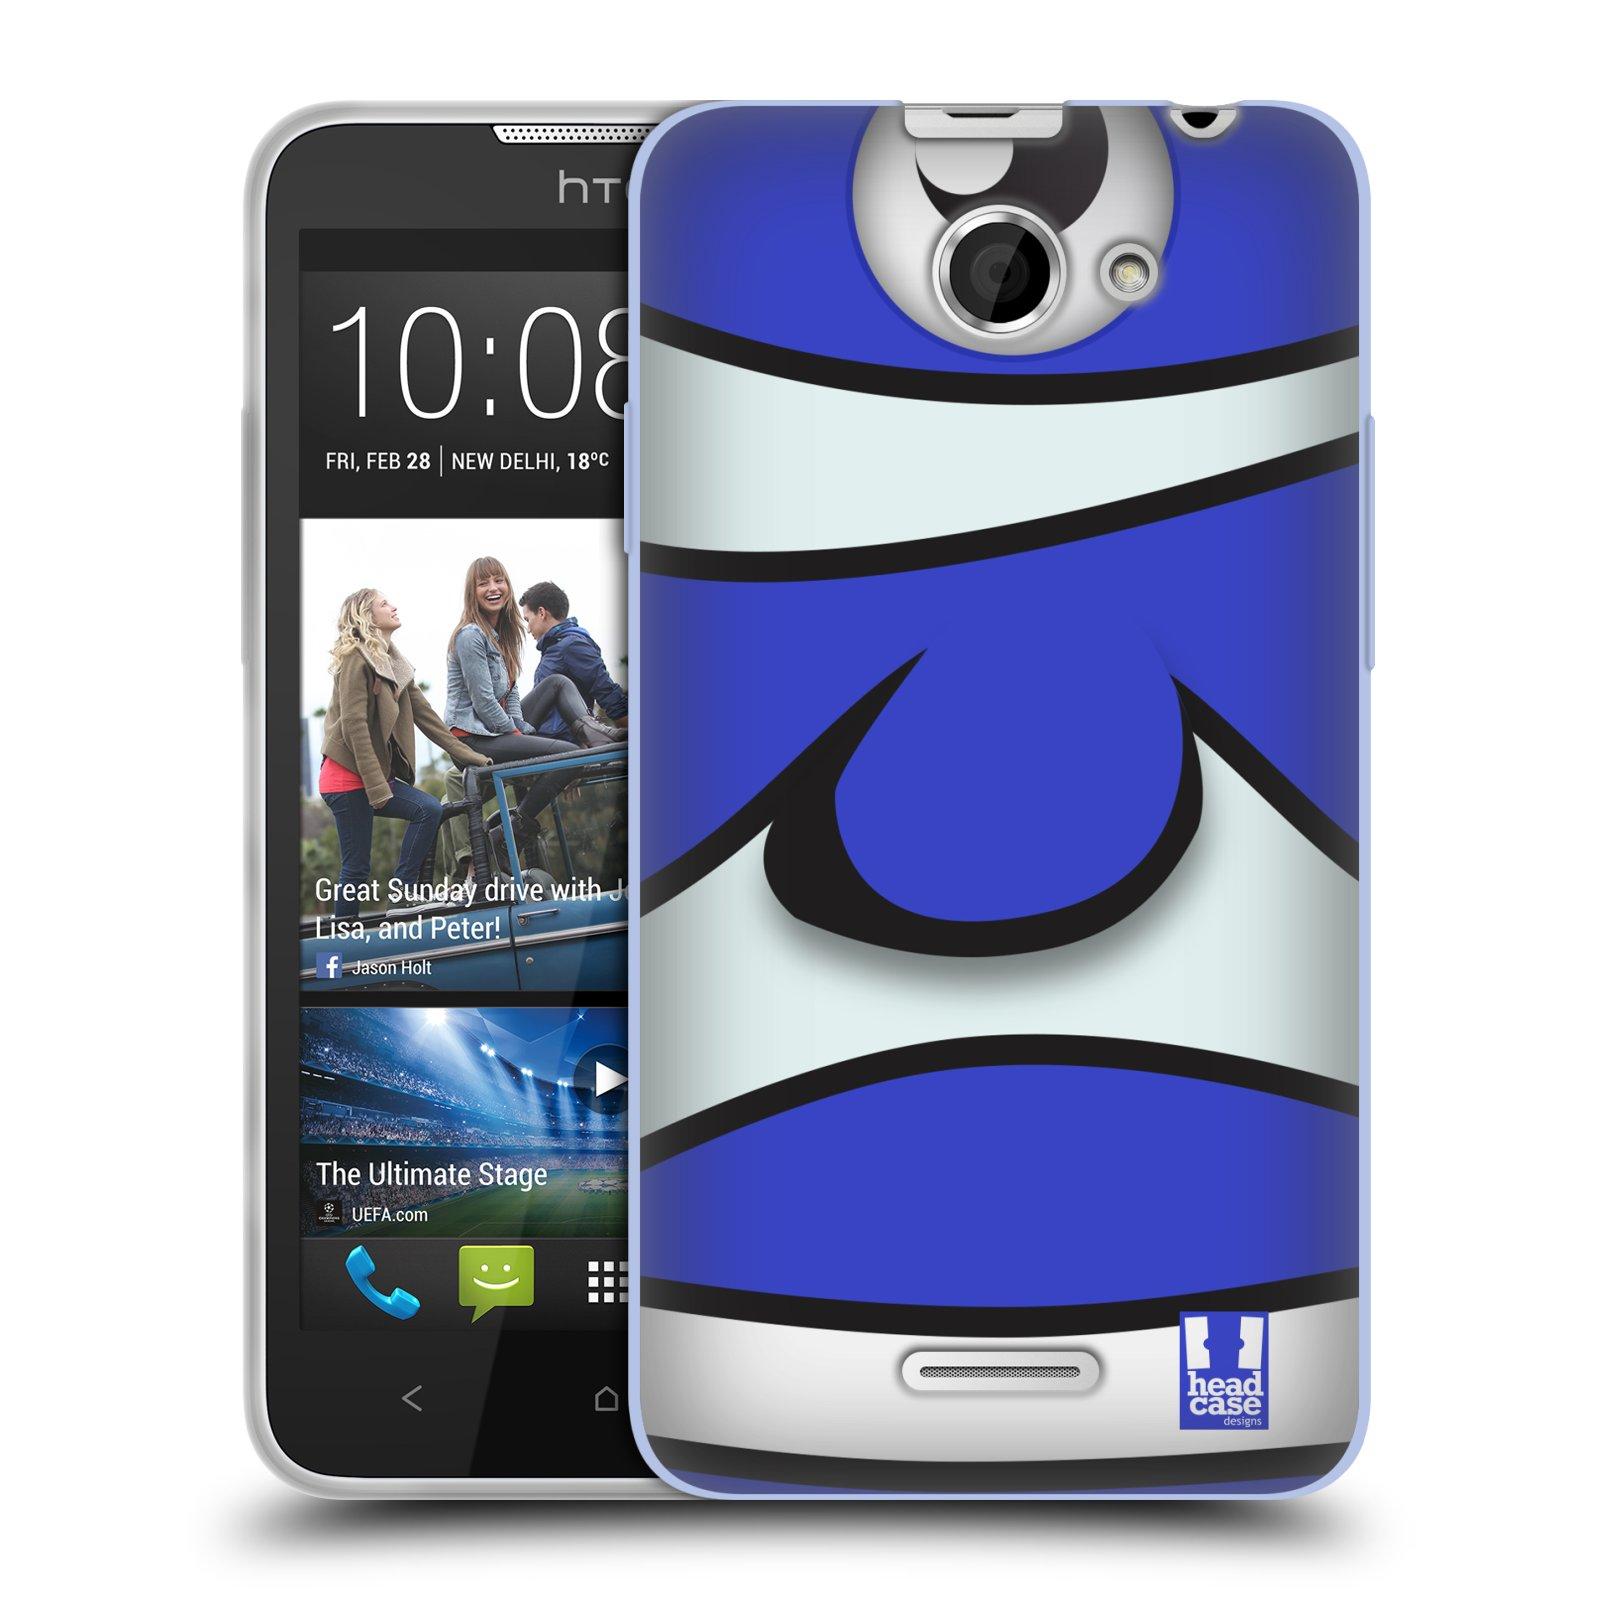 HEAD CASE silikonový obal na mobil HTC DESIRE 516 vzor Rybičky z profilu modrý klaun